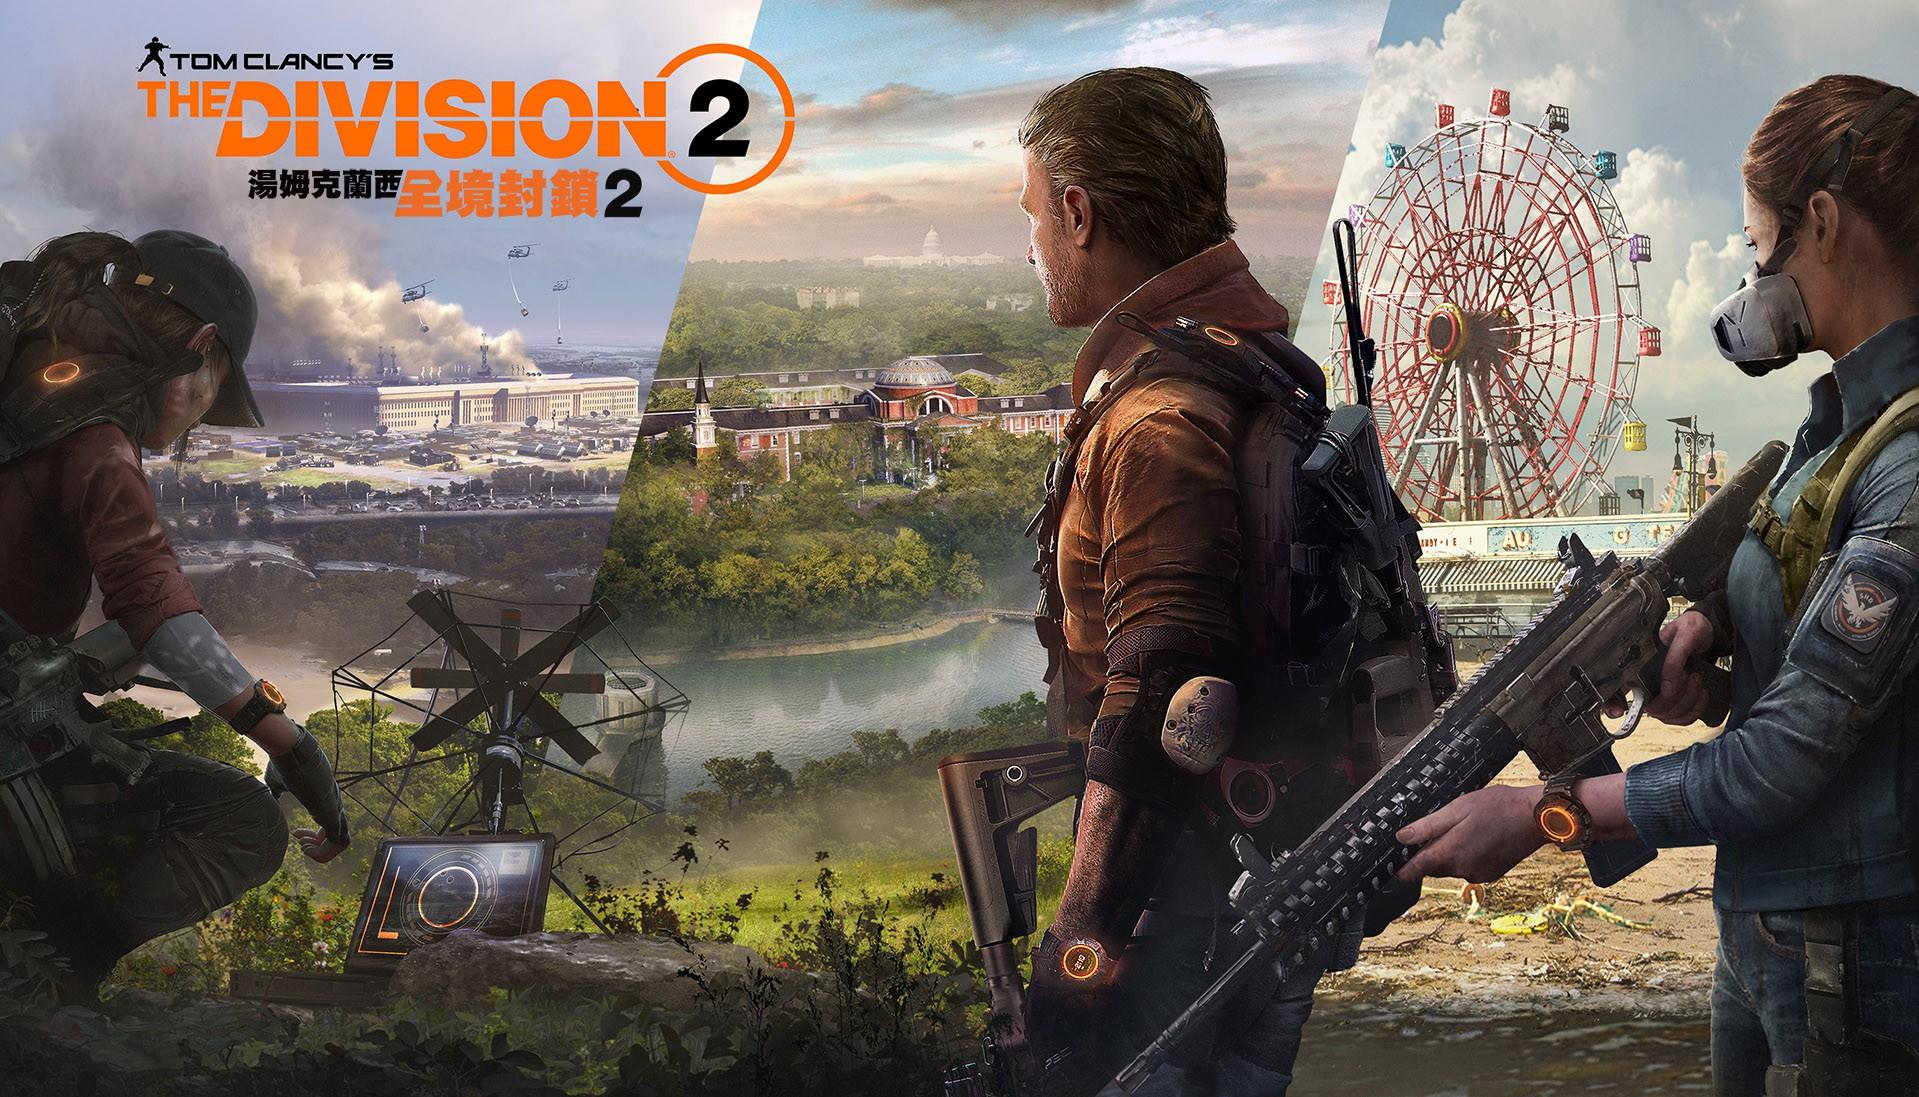 【E3】《全境封鎖2》新一年內容路程公布  周末免費試玩開始!